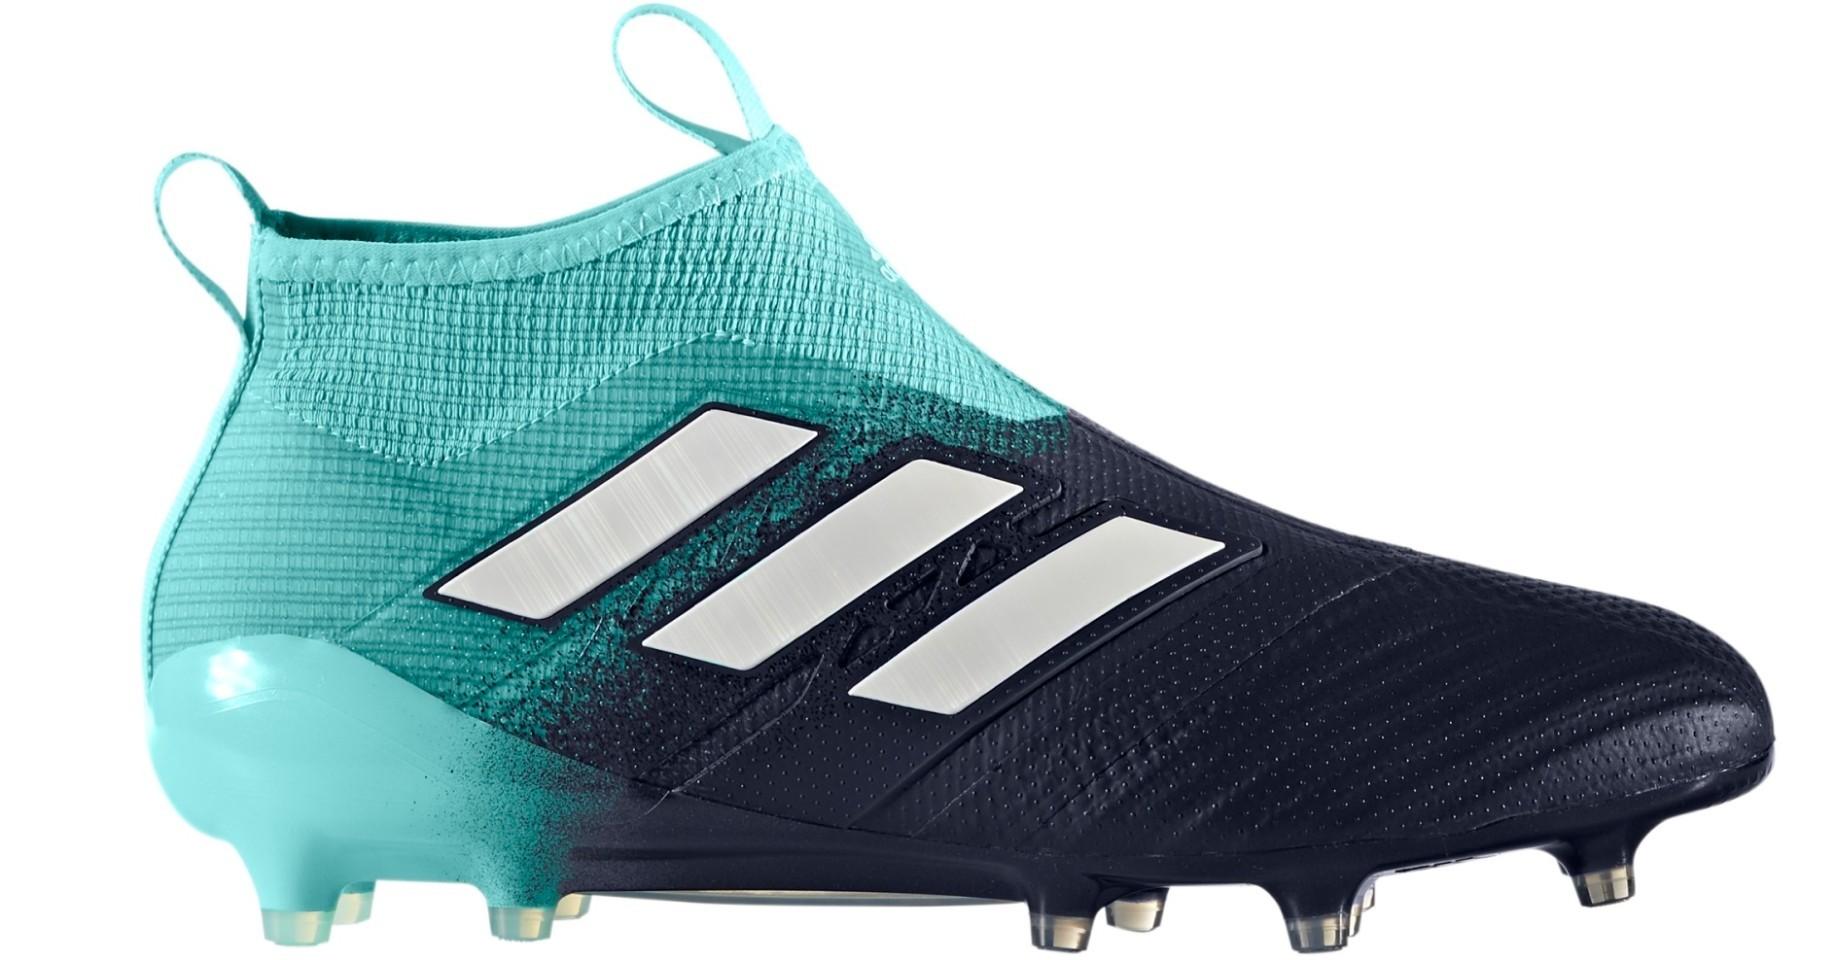 size 40 4b226 ac225 Scarpe Calcio Adidas Ace 17+ Purecontrol FG Ocean Storm Pack colore Blu  Azzurro - Adidas - SportIT.com